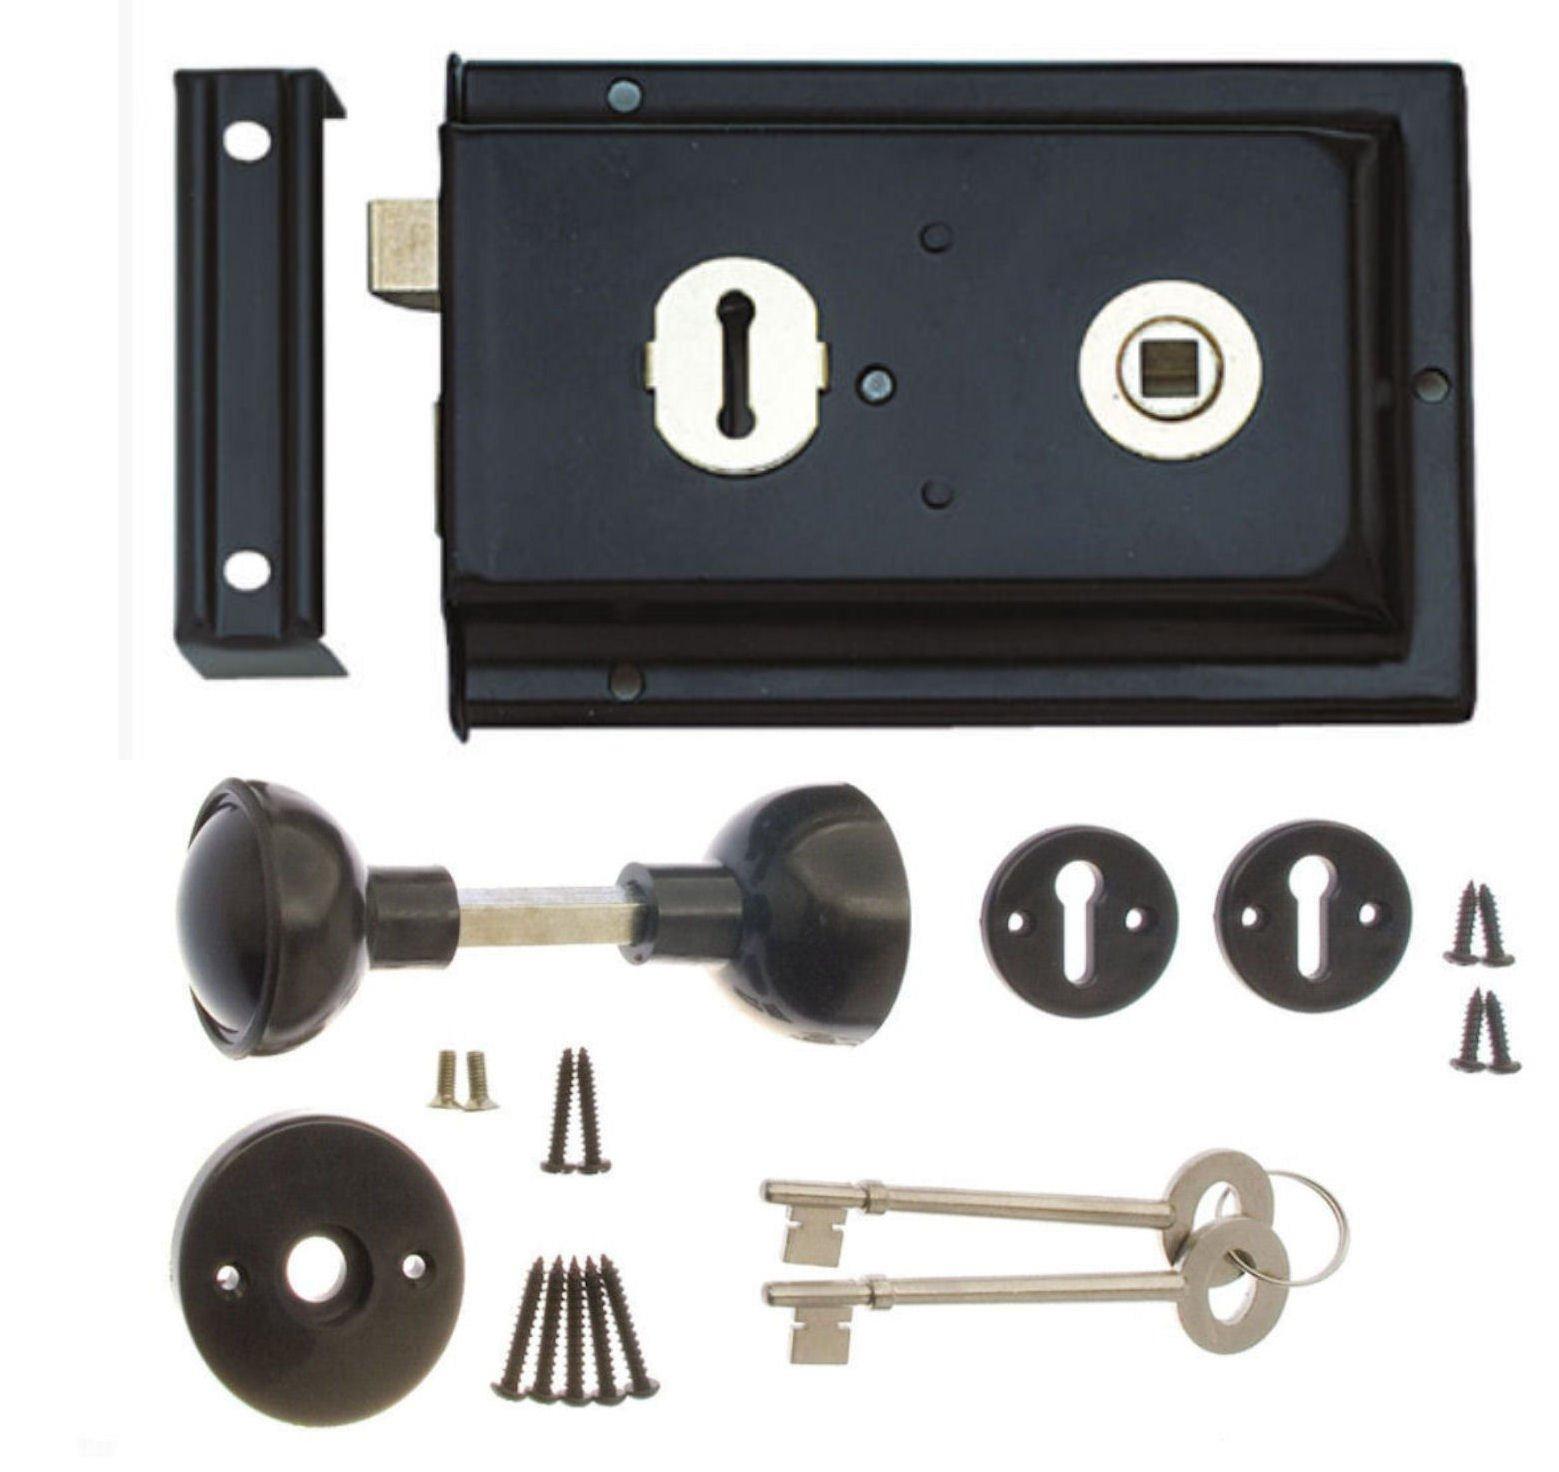 "Rim Lock & Handle Set 6 x 4"" Sashlock with Knobs - Black"